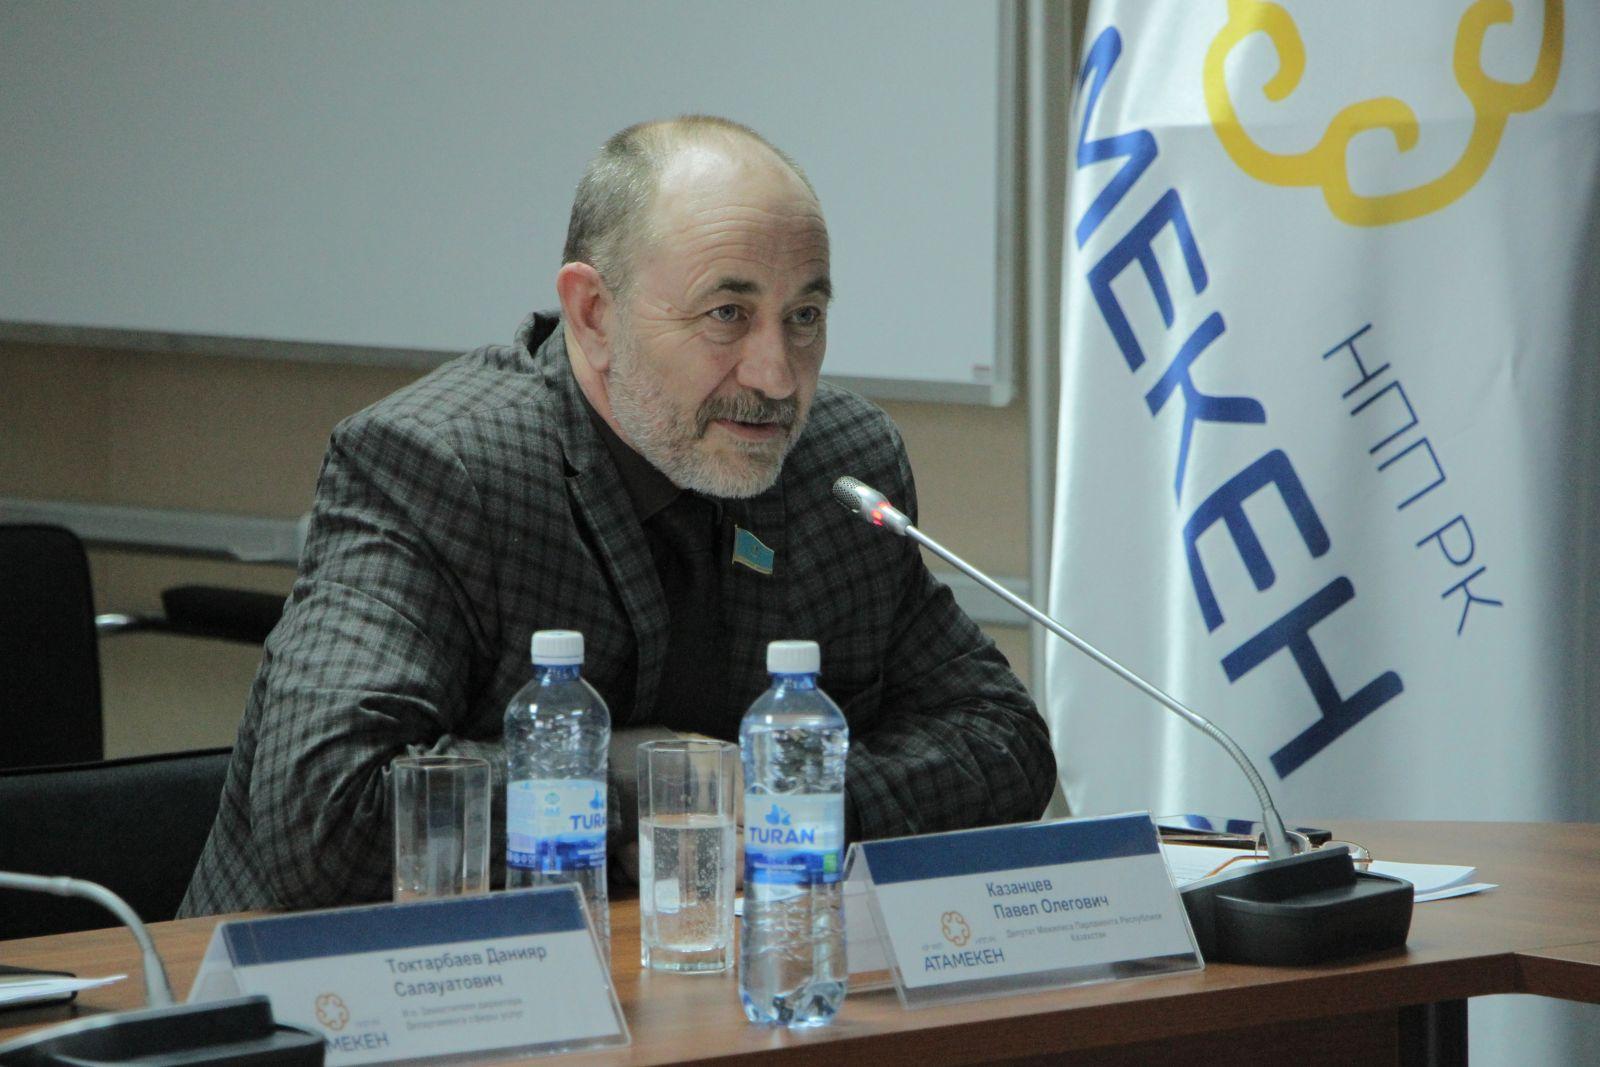 Казанцев Павел Олегович